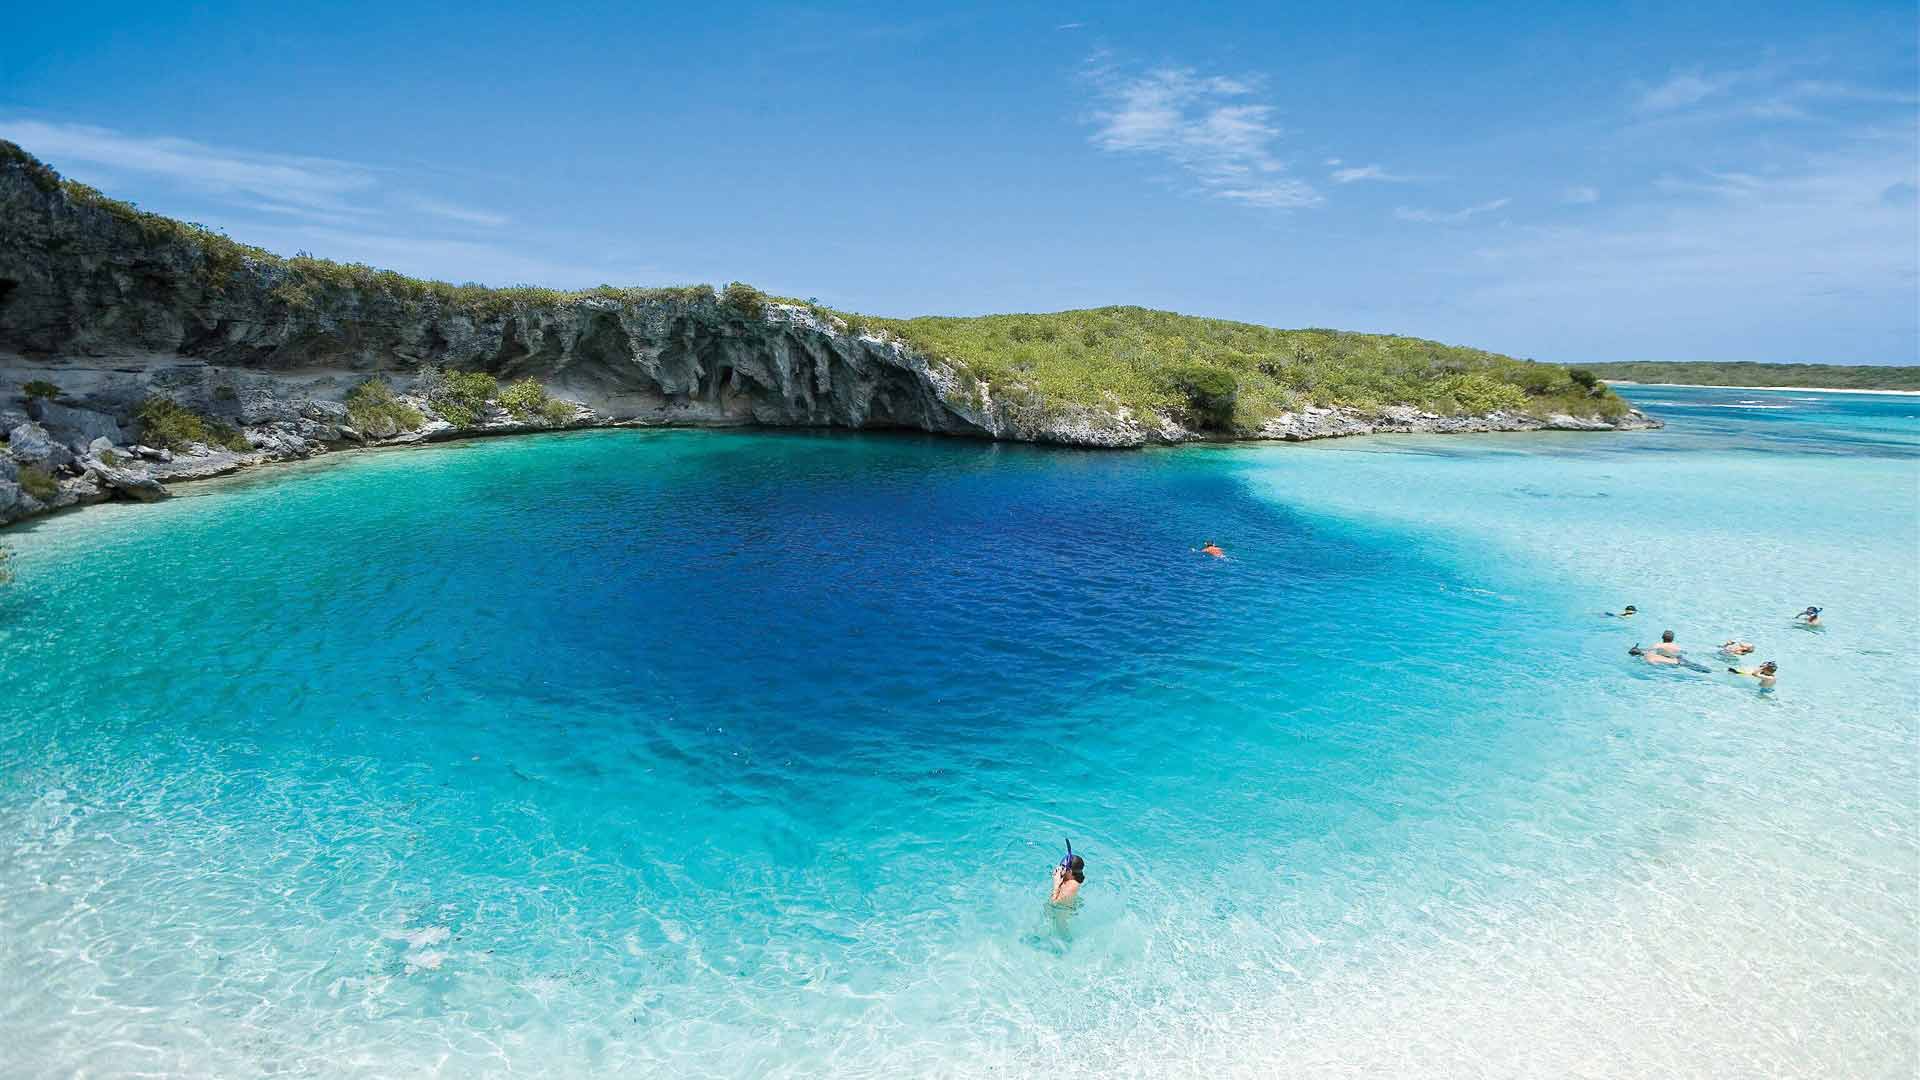 Acklins & Crooked Island, Bahamas